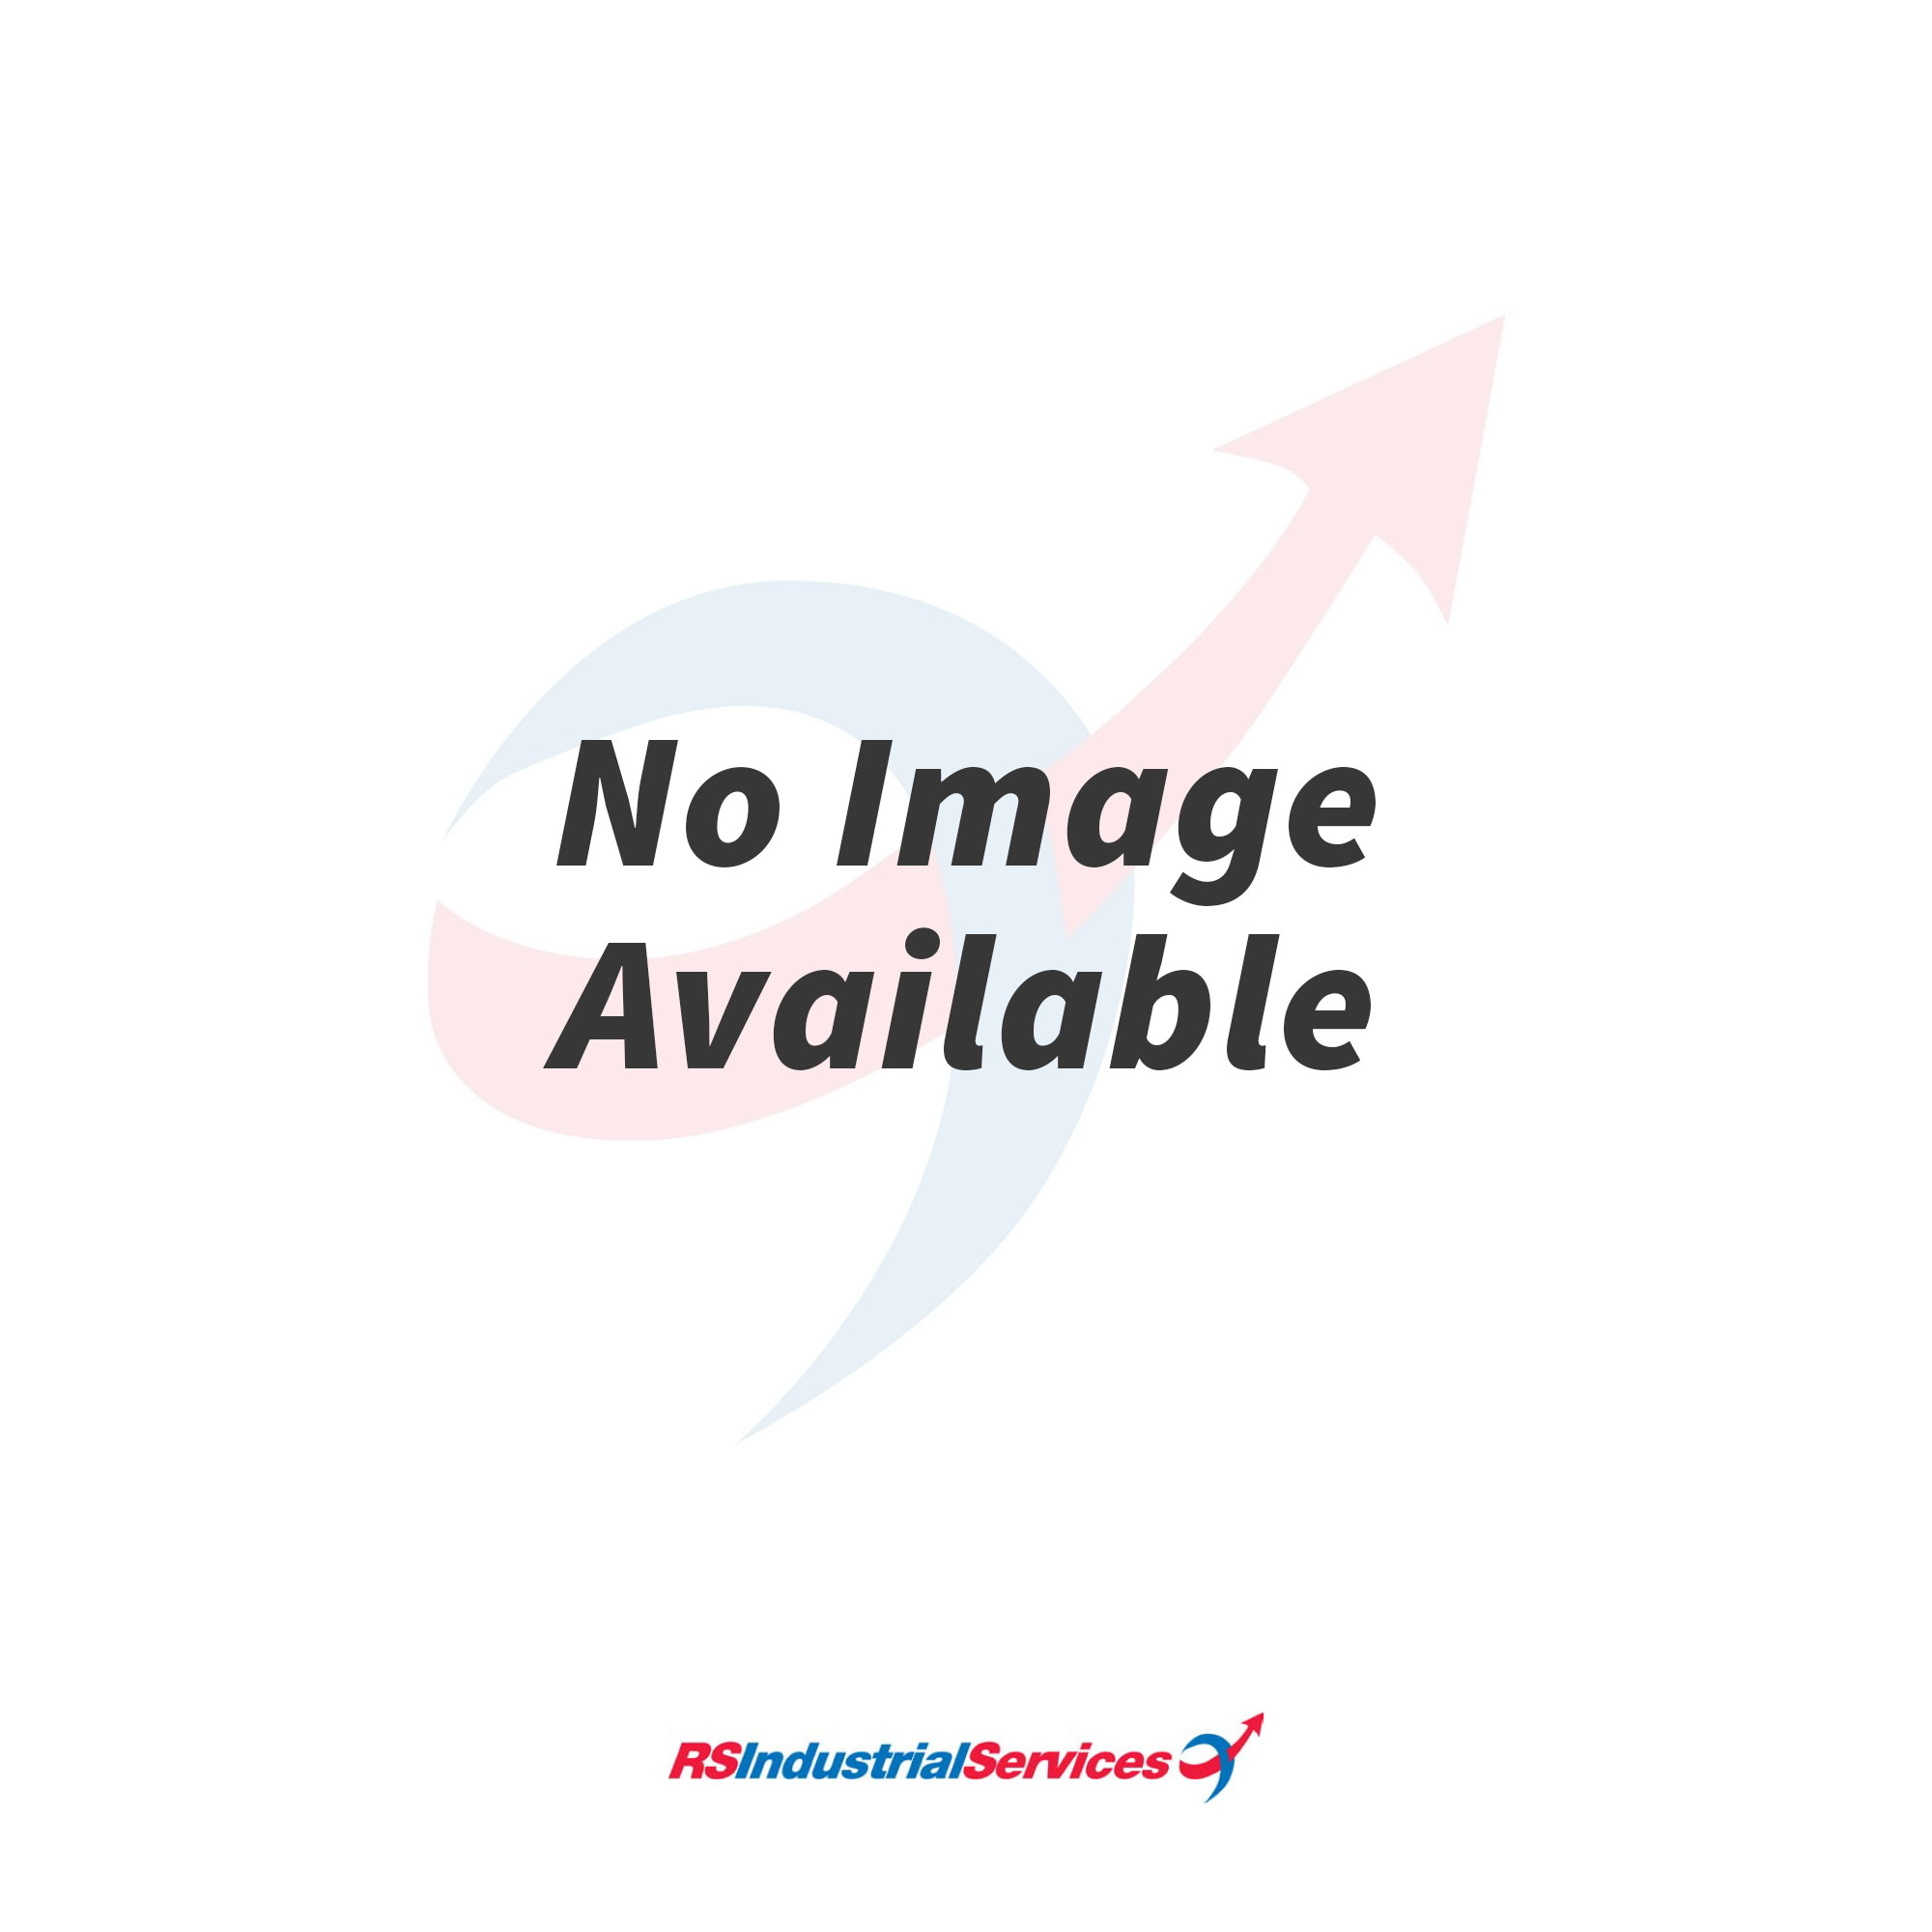 Ultraseal PTFE Gasket Sealing Tape 25mm(W) x 5m(L)